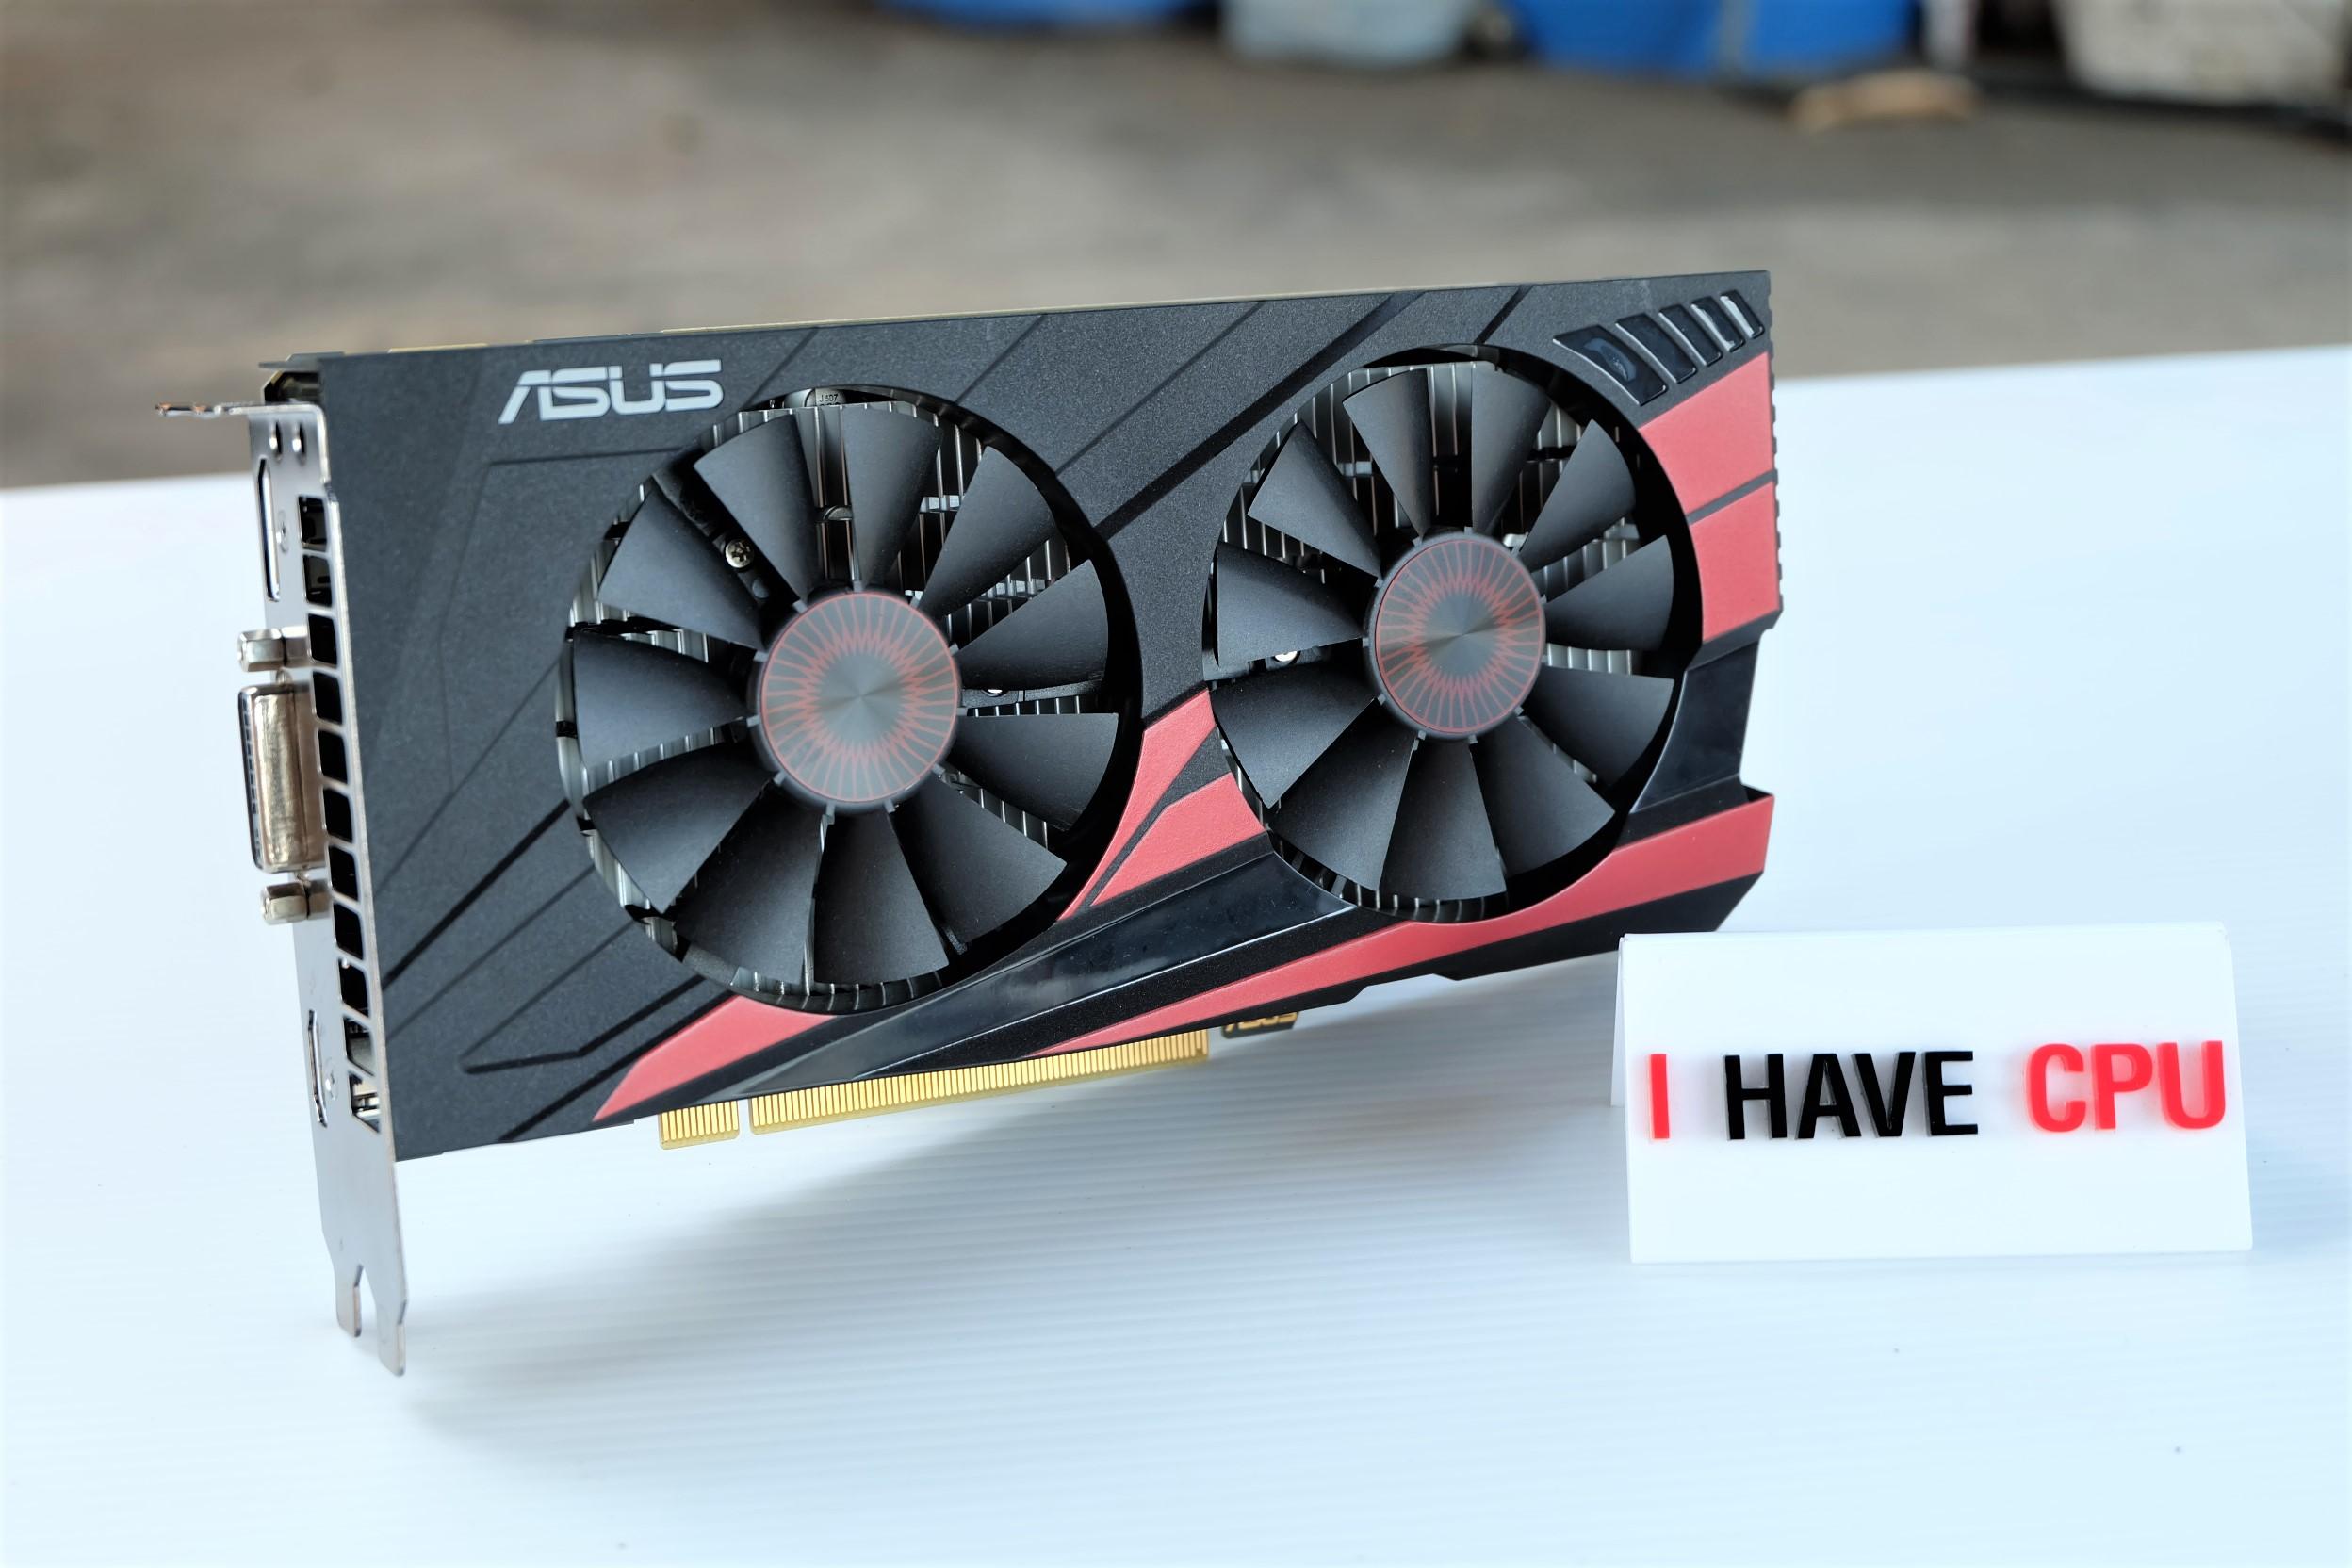 ASUS GEFORCE GTX 950 2GB OC ไม่ต่อไฟเลี้ยง